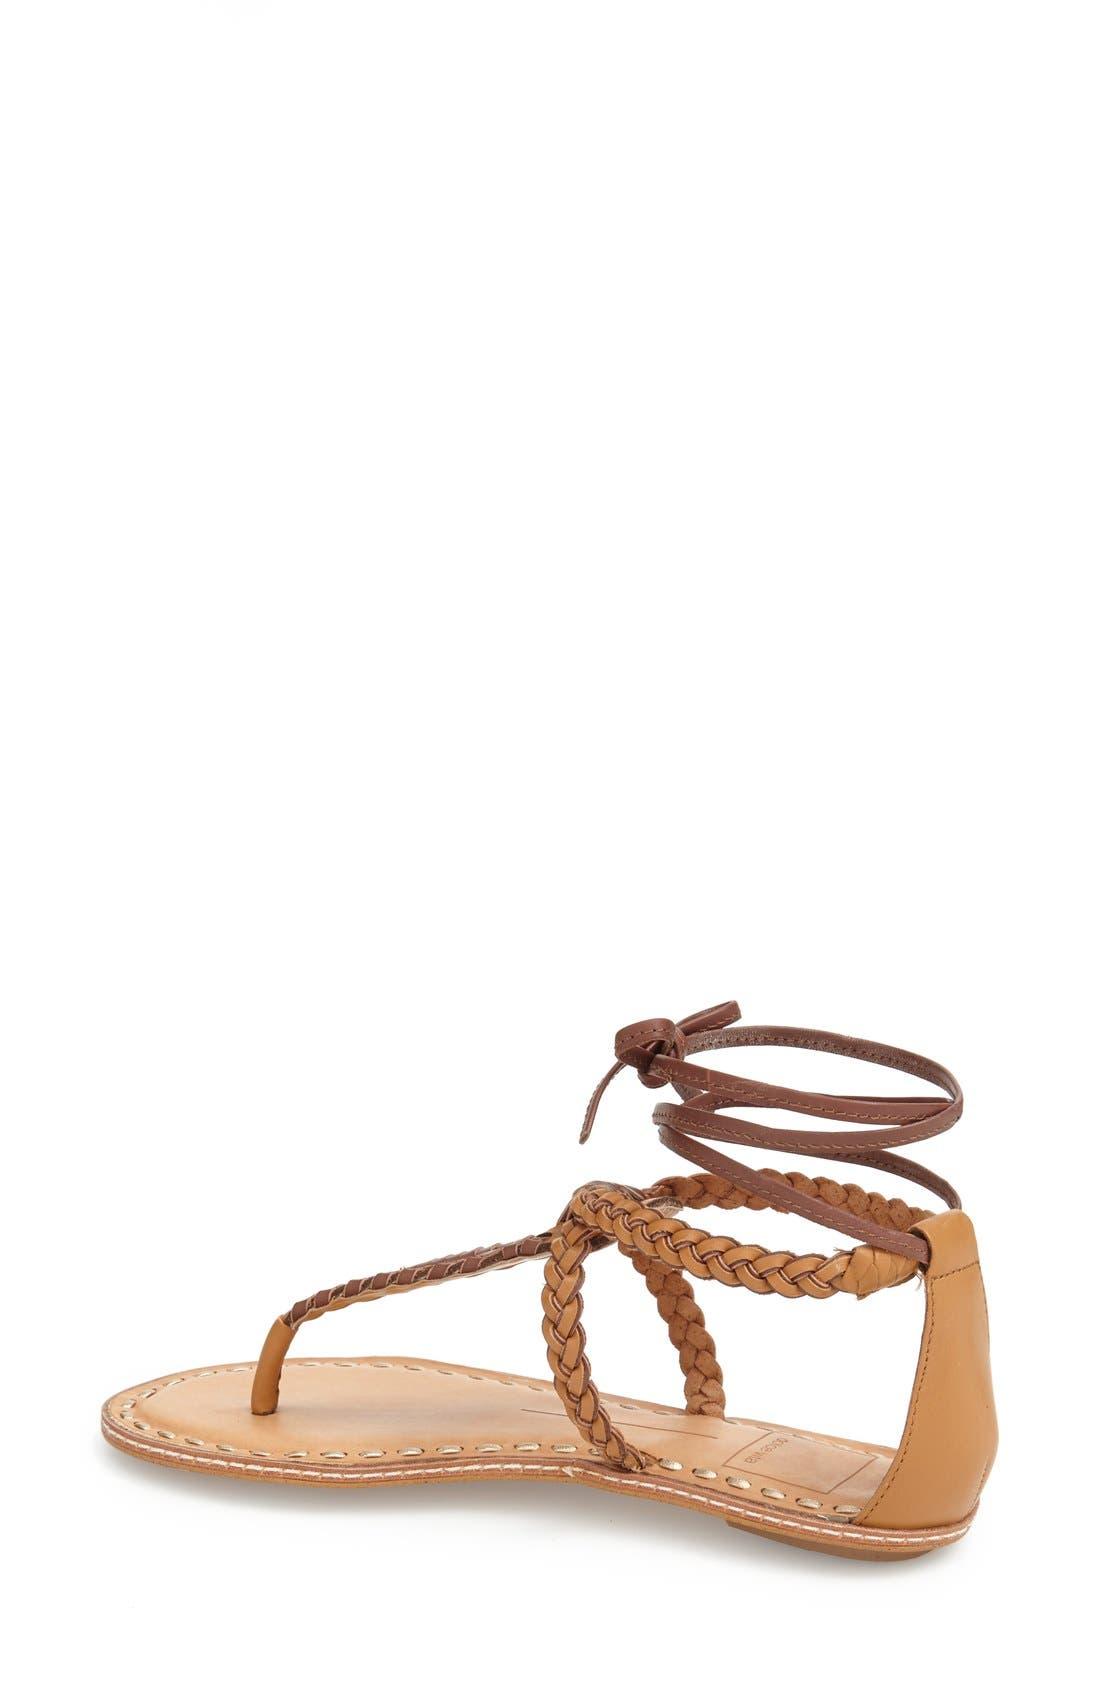 Alternate Image 2  - Dolce Vita 'Keoni' Flat Sandal (Women)